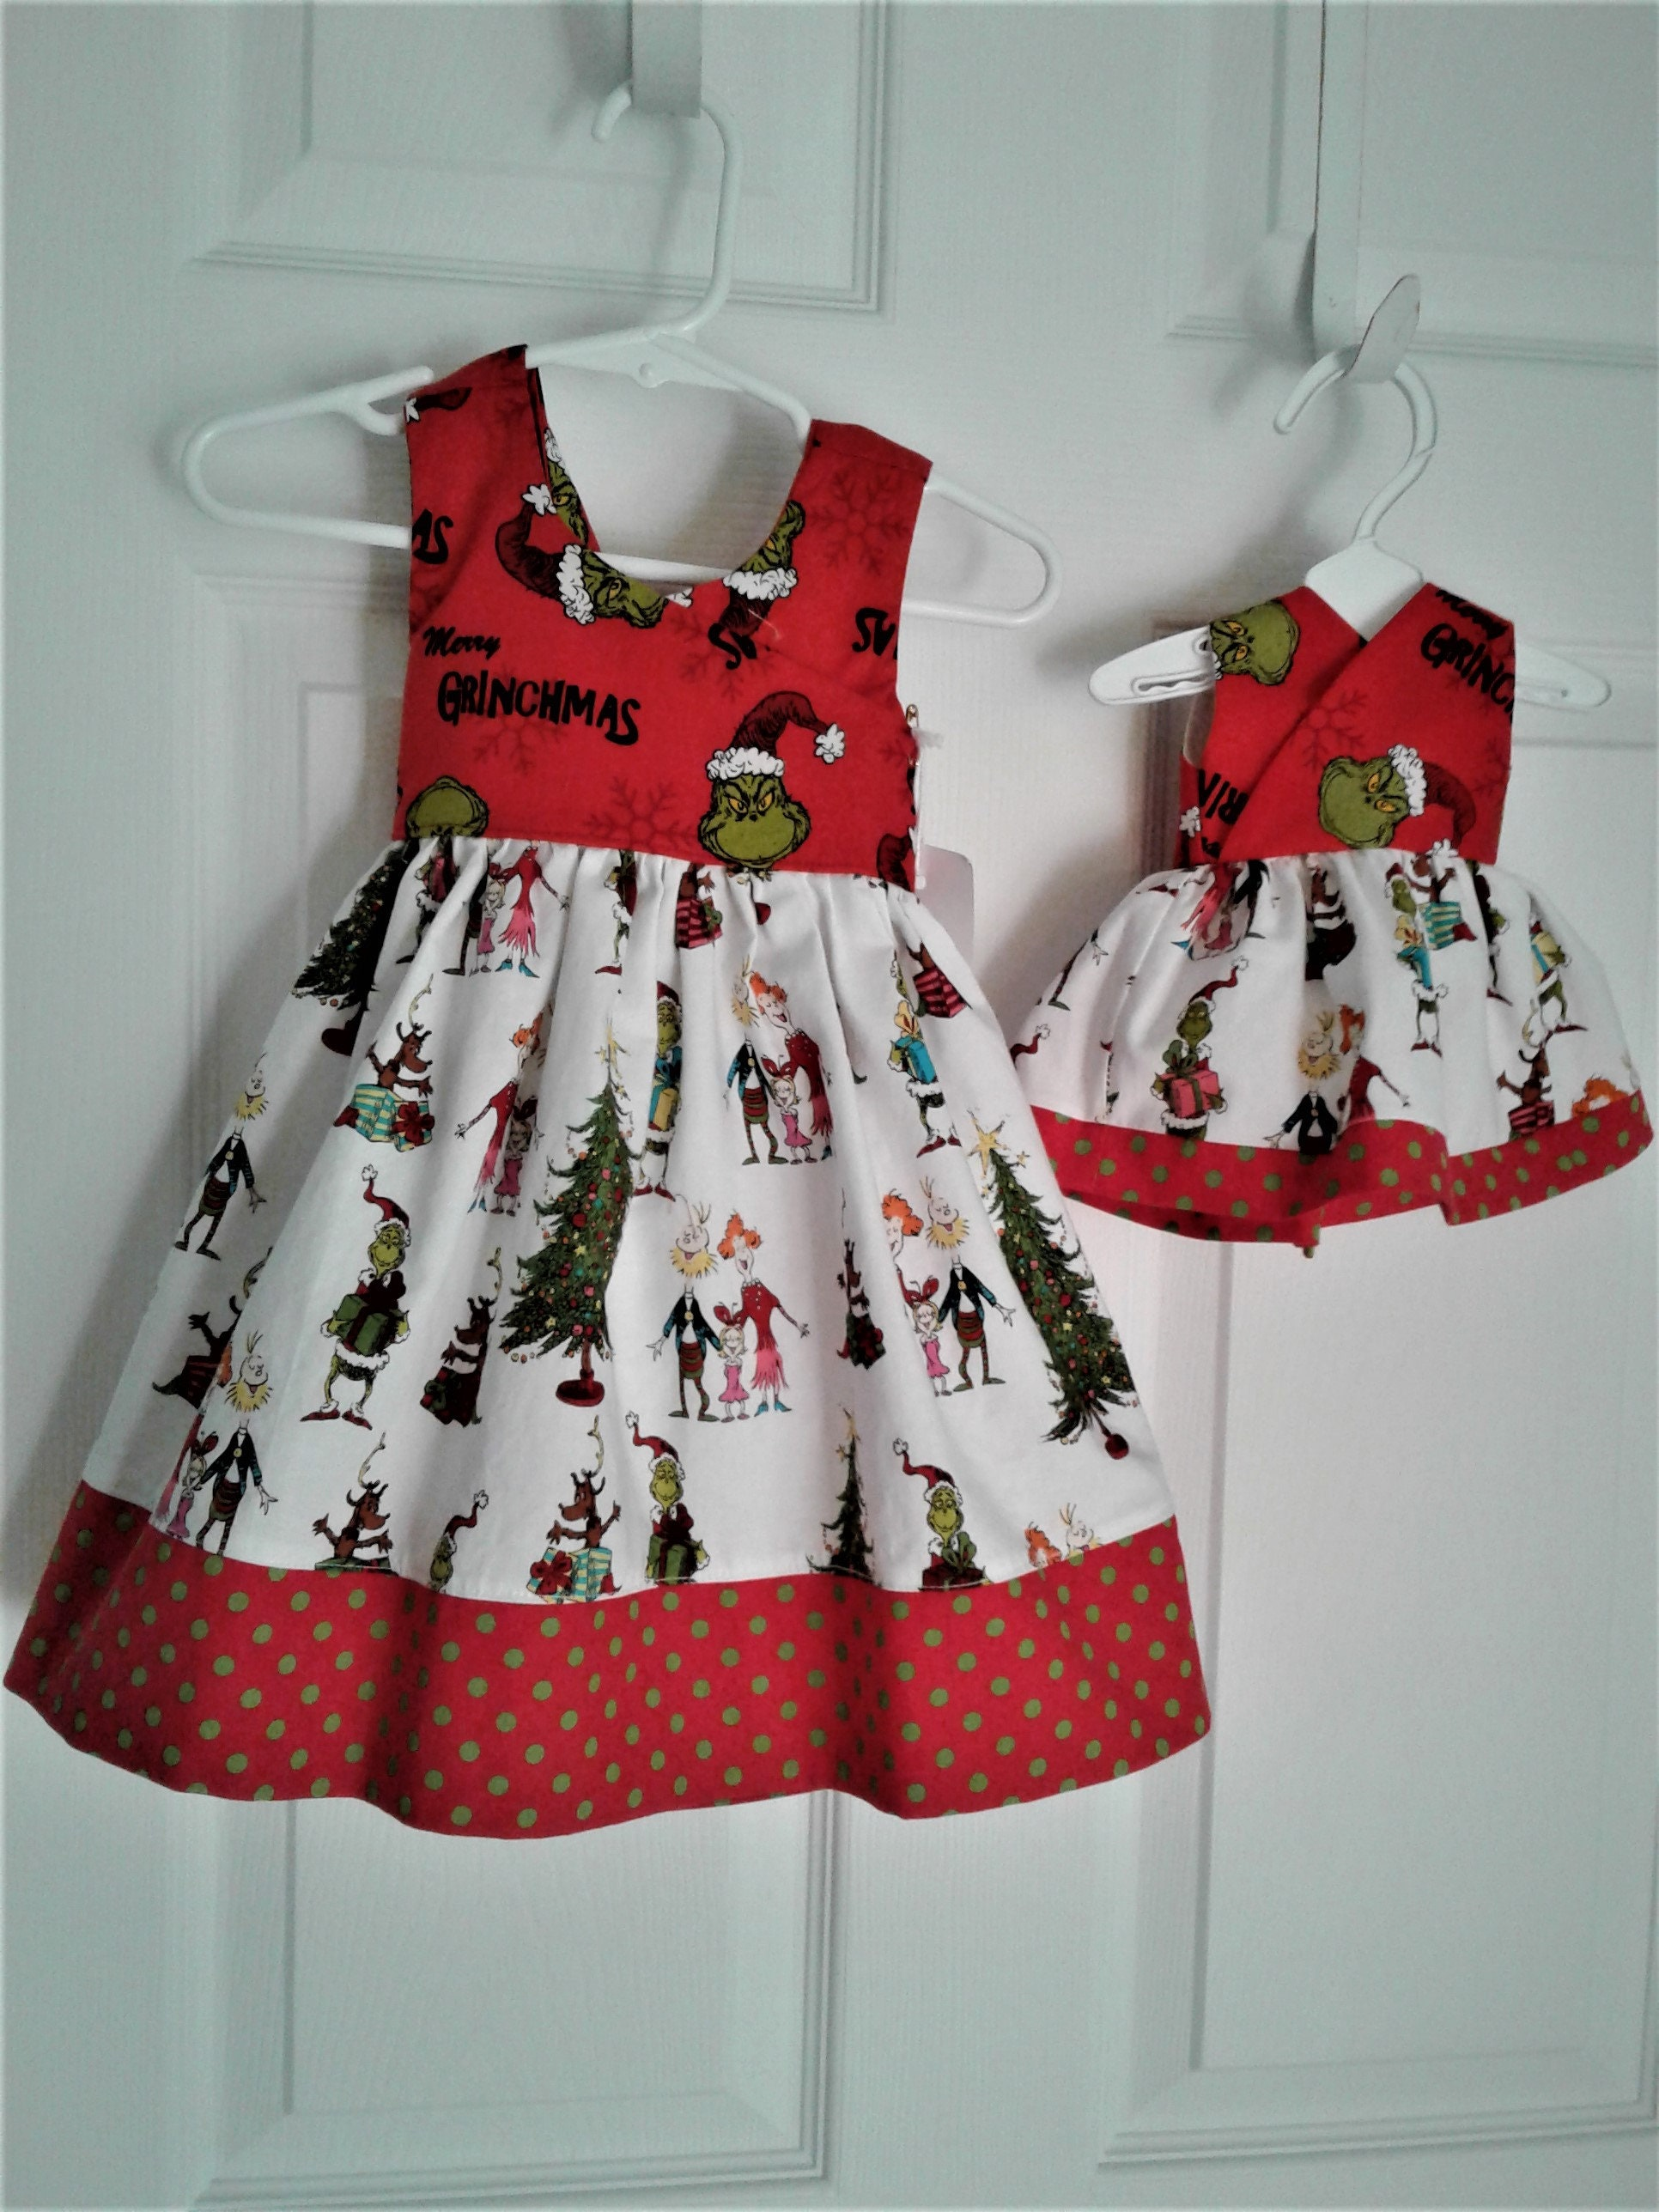 06fcebb55 Grinch Dress, Christmas Dress, Baby Dress, Toddler Dress, Santa ...